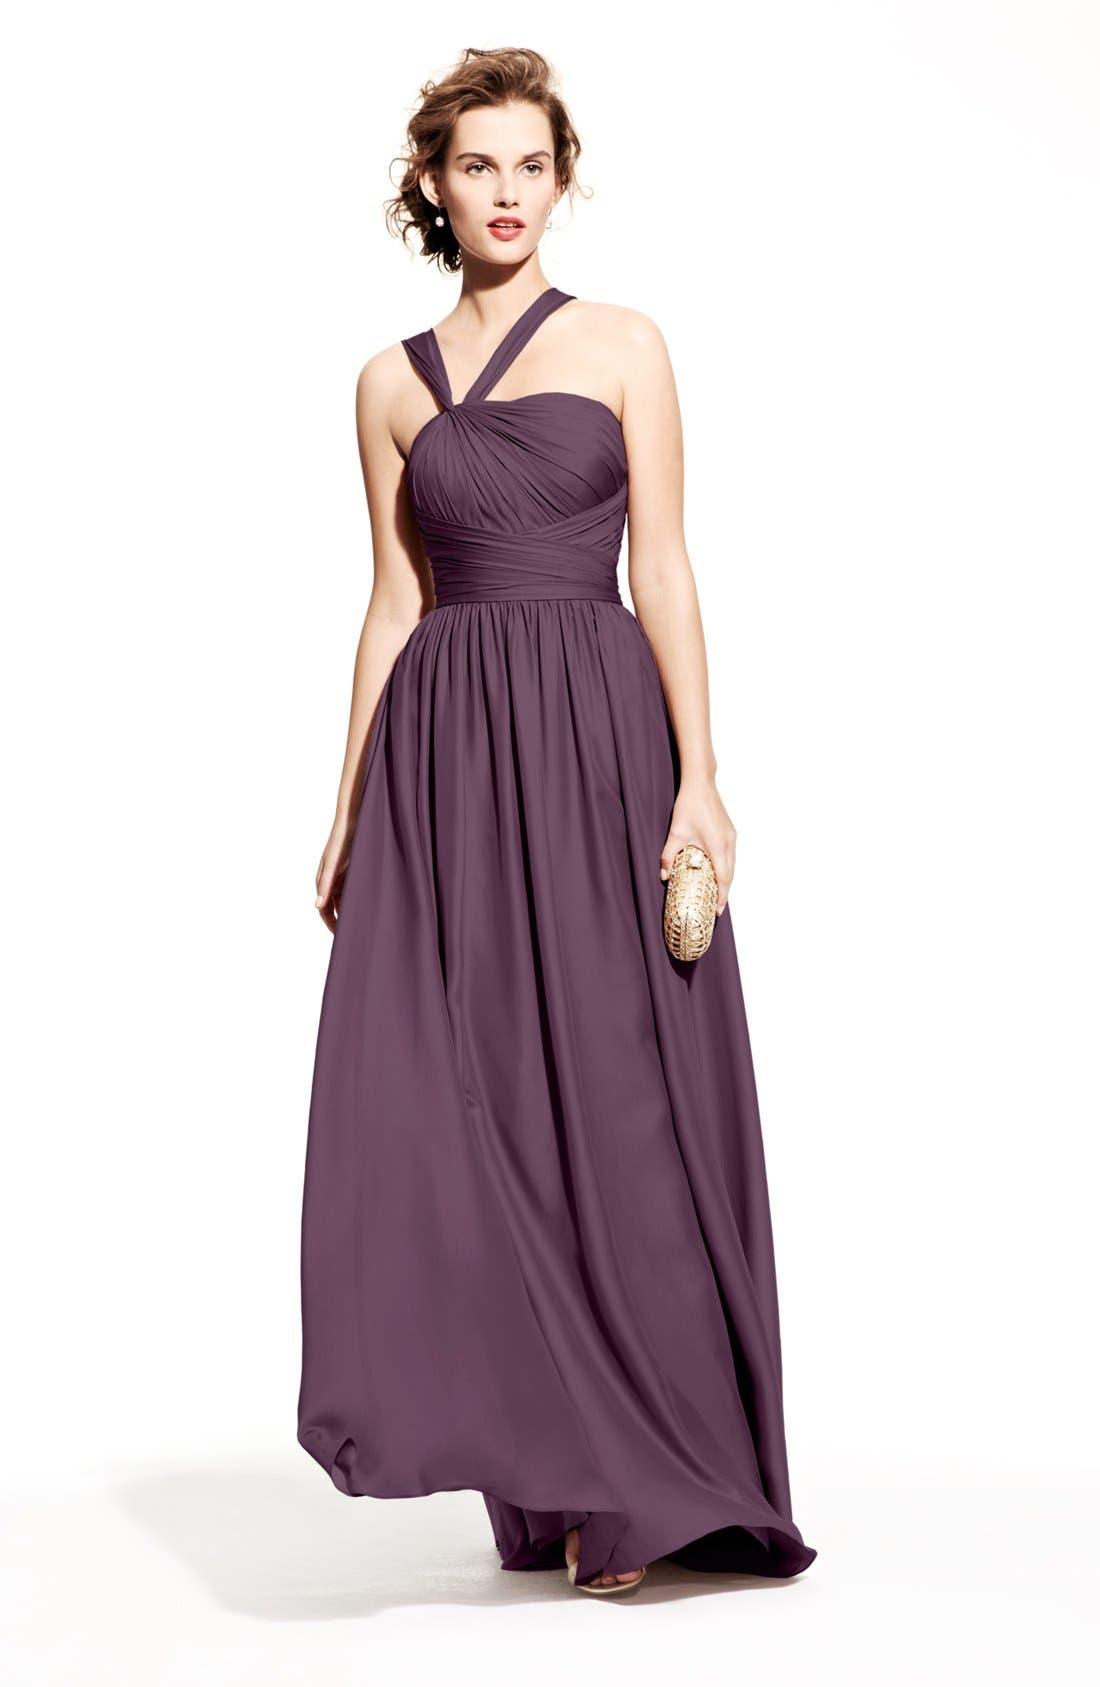 Alternate Image 1 Selected - ML Monique Lhuillier Bridesmaids Chiffon Dress & Accessories